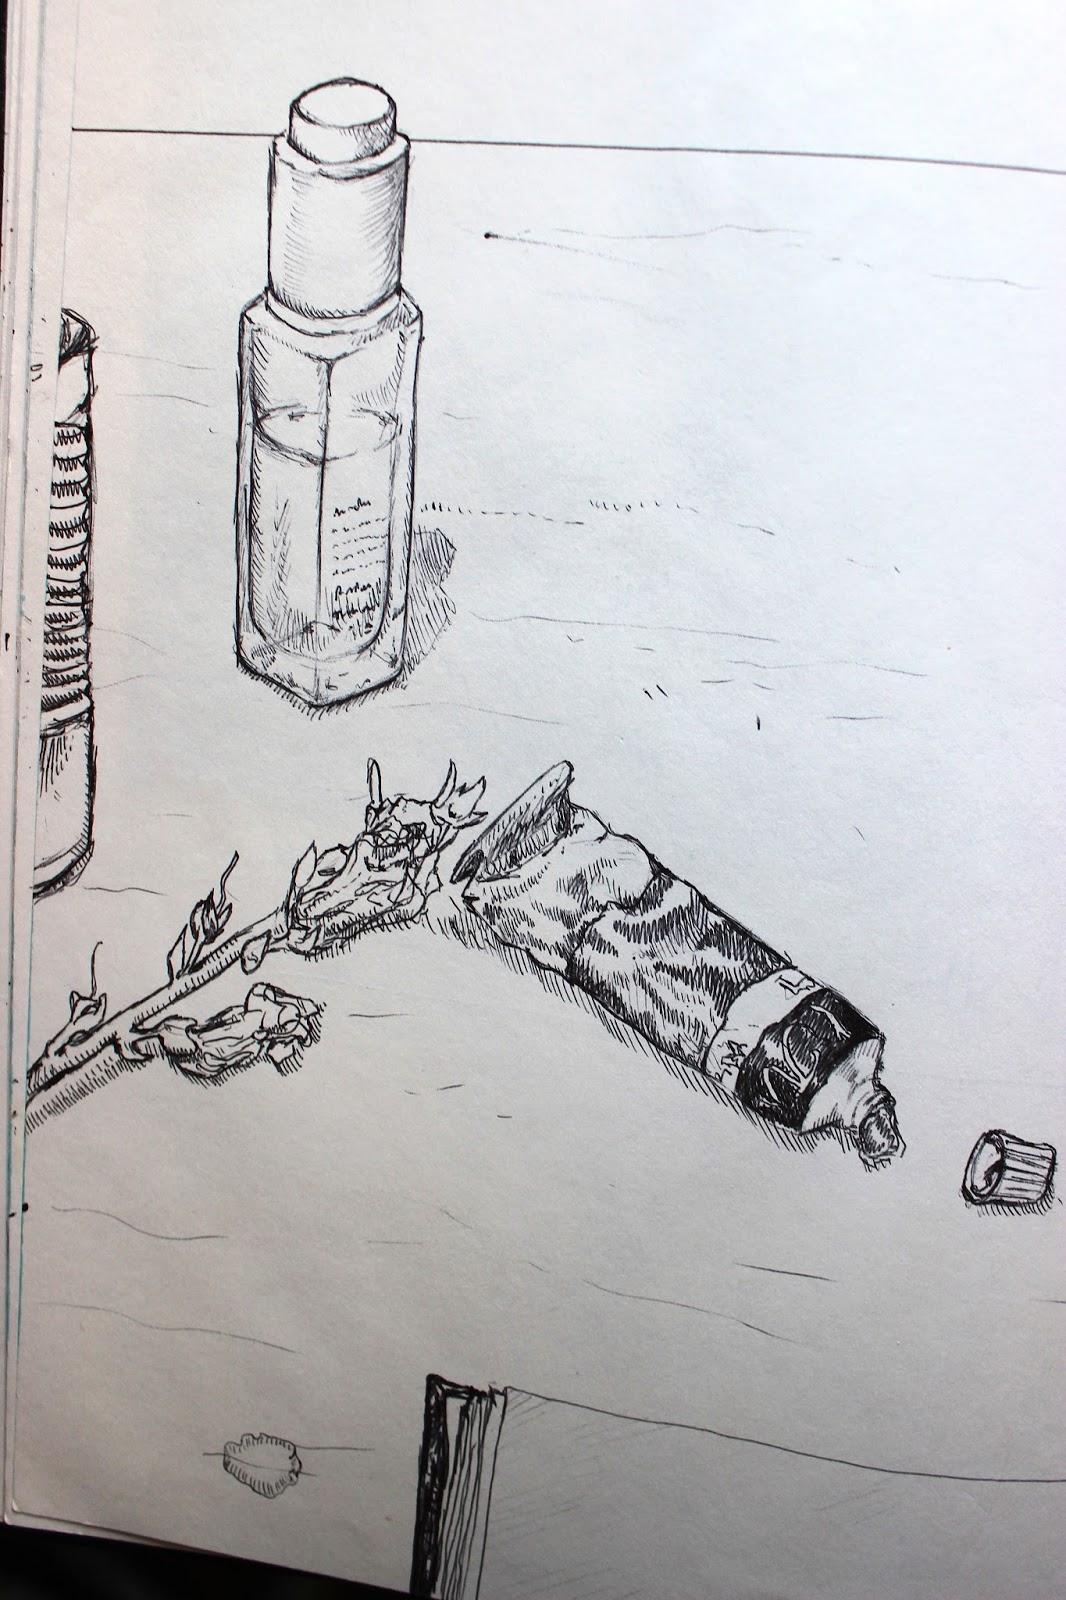 Drawing Sketch Illustration Pencil Sketchpad Notebook Desk Paint Tubes